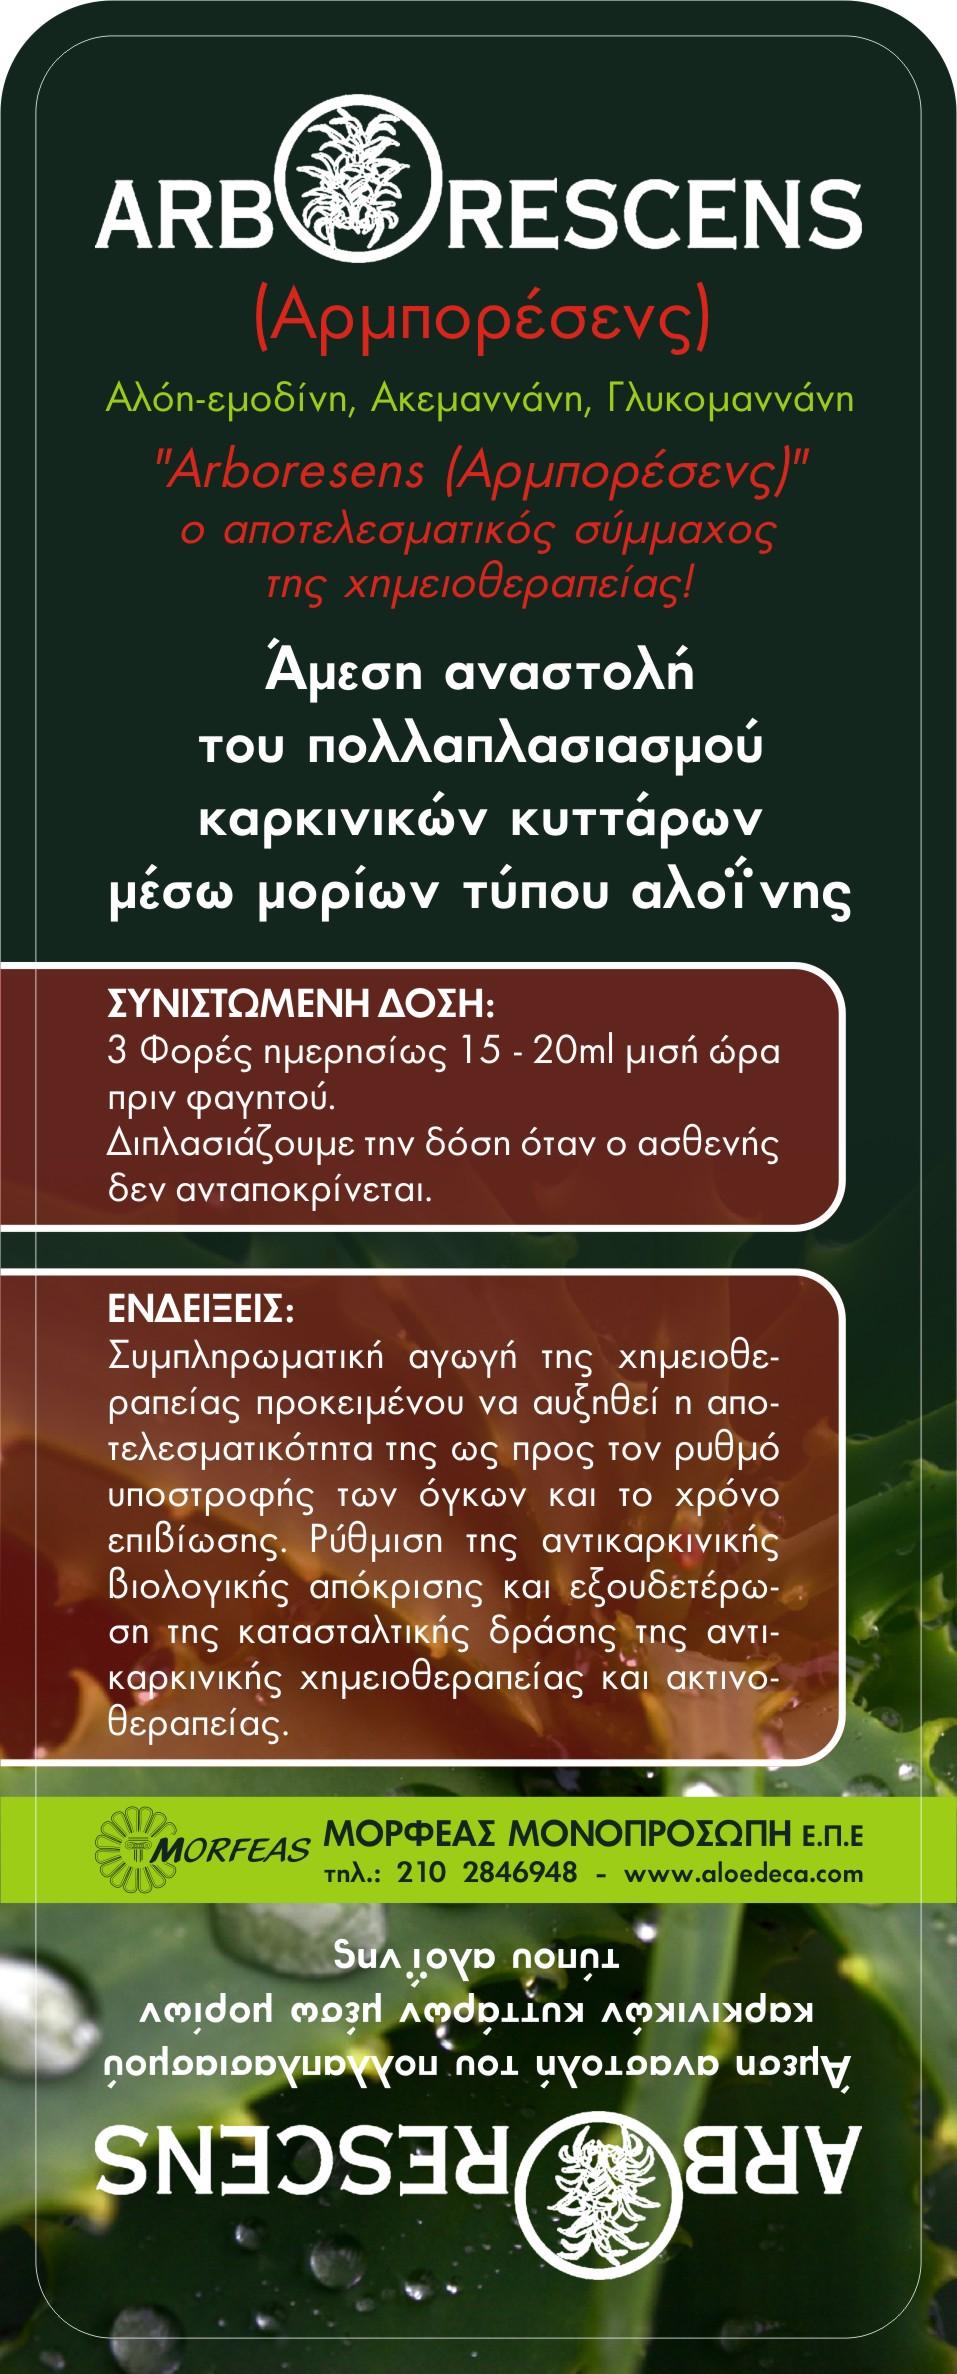 arborescens doctors leaflet front